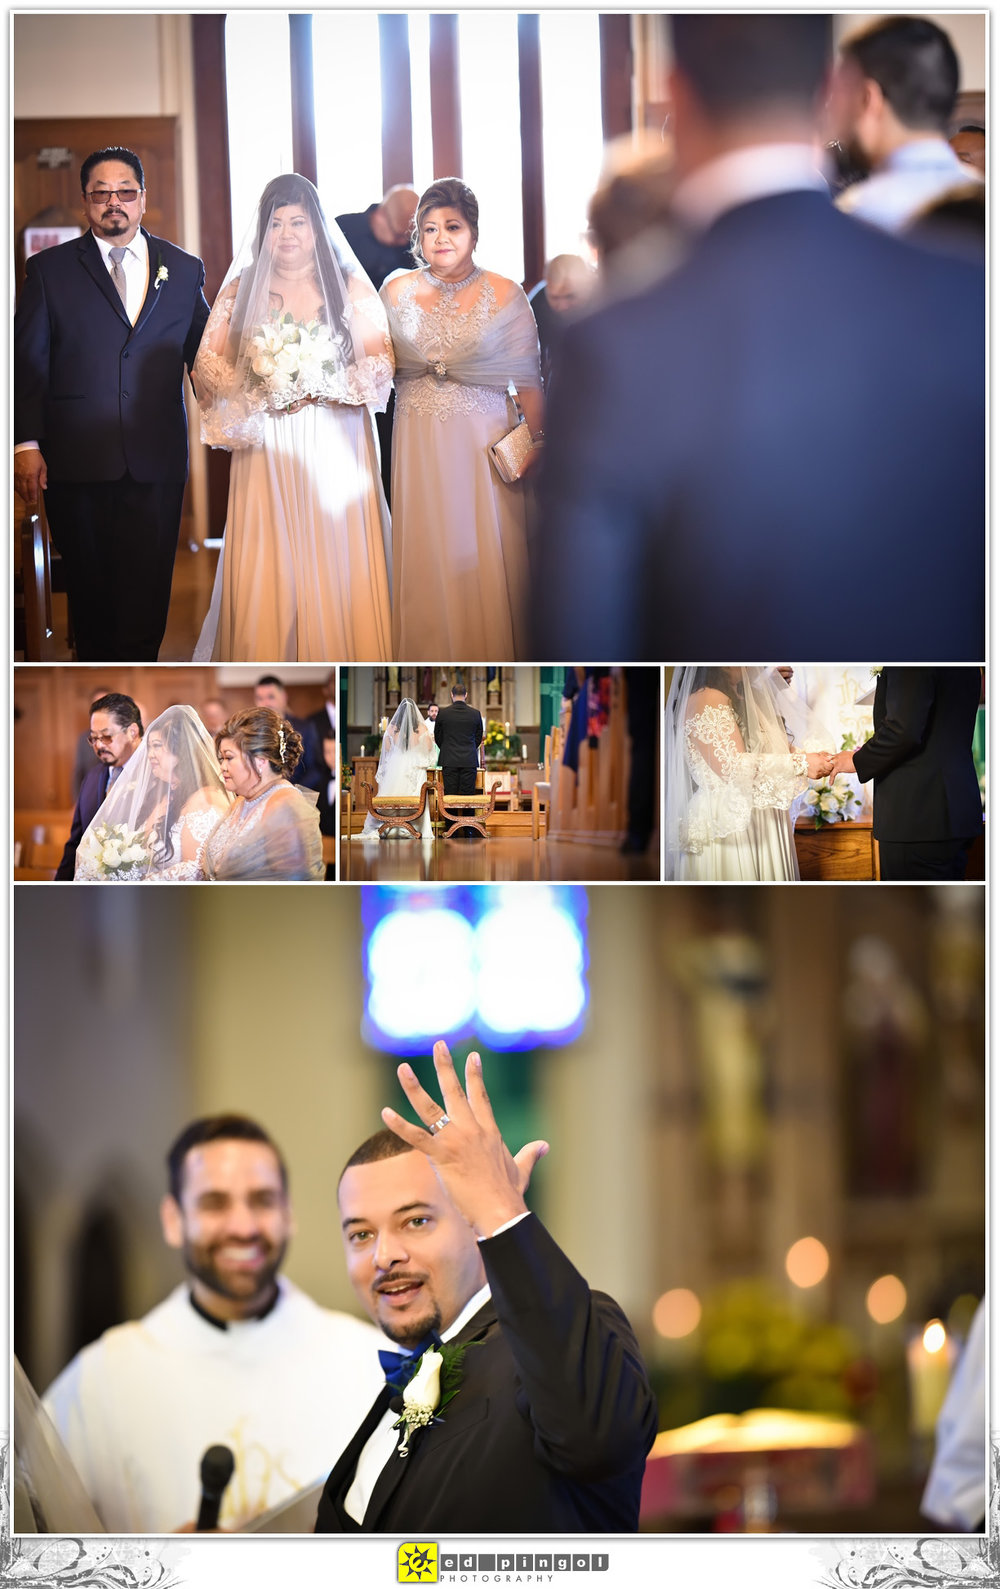 EDs TEASERS Chris and Allison Wedding 186047.JPG